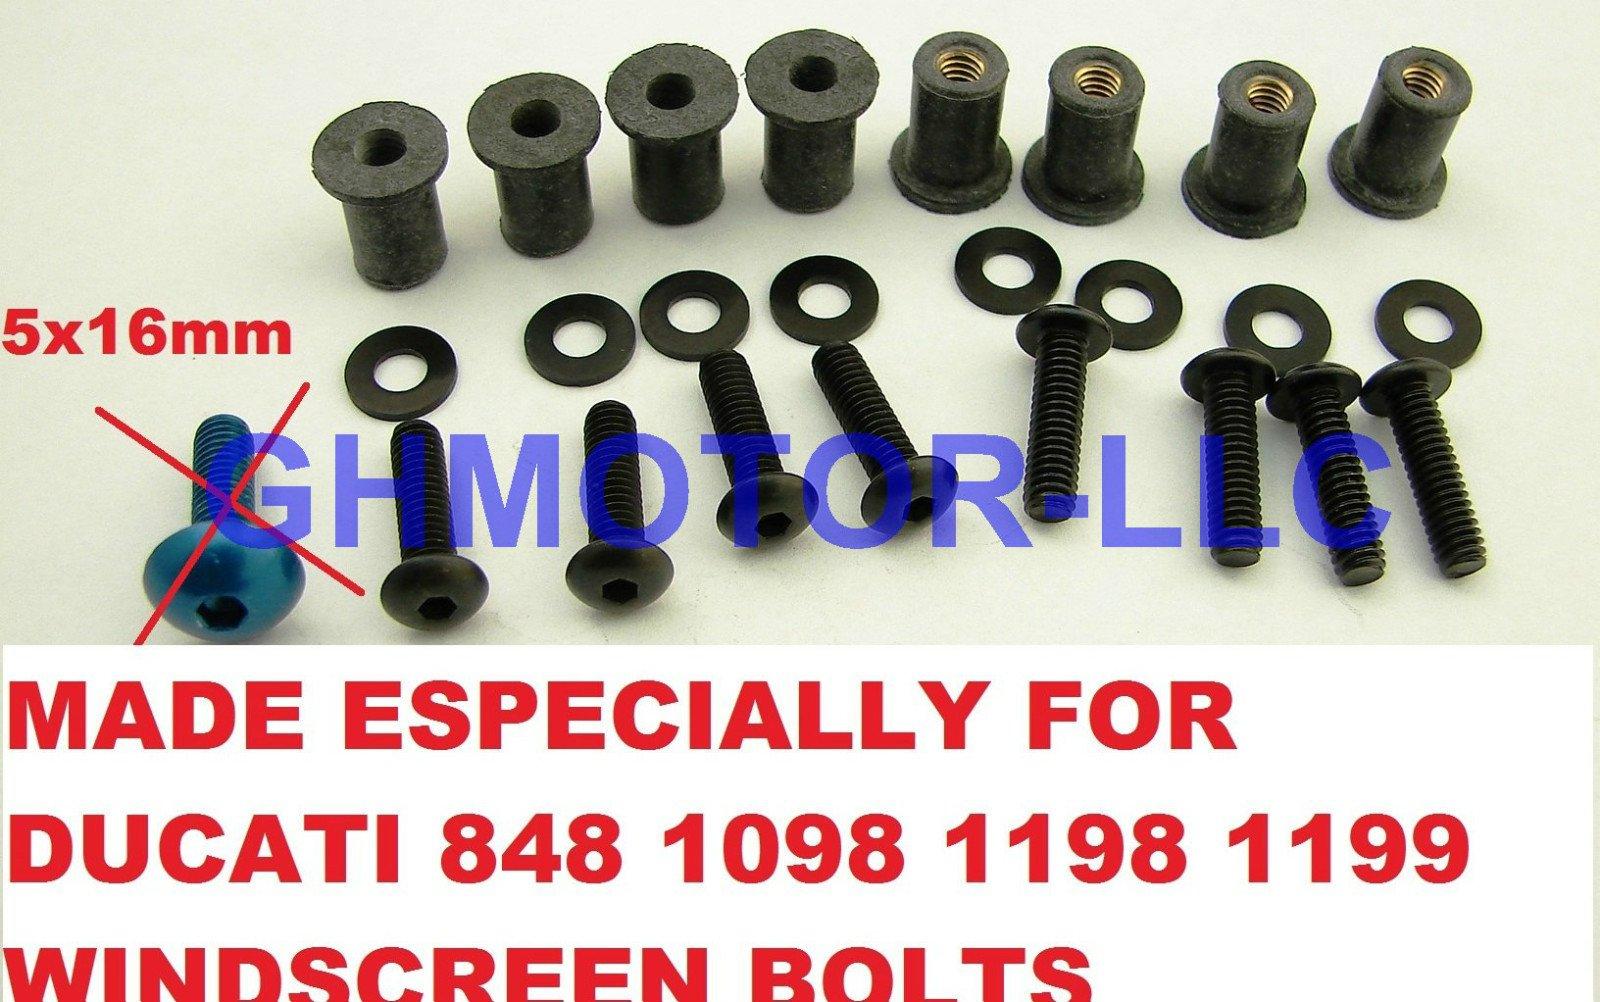 Ducati 848 1098 1198 1199 899 959 1299 SuperSport Panigale Corse V4 S R Black Windscreen Windshield Bolts Screws Kit Usa